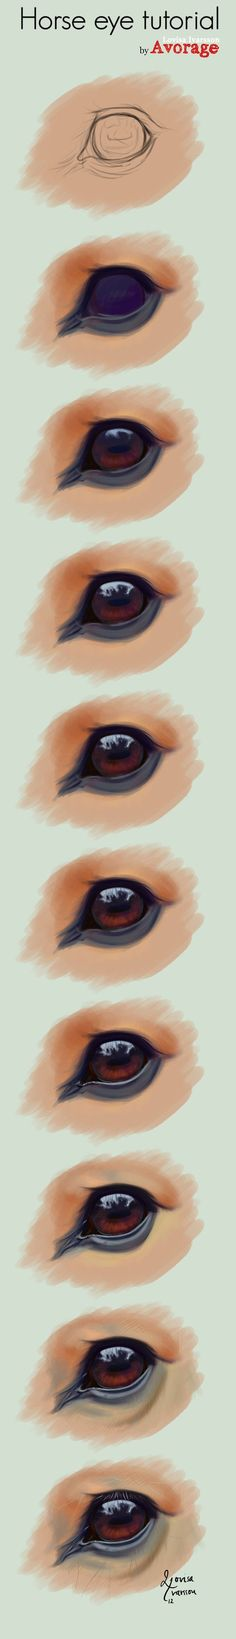 horse eye drawing / horse eye drawing , horse eye drawing easy , horse eye drawing tutorial , horse eye drawing pencil , horse eye drawing step by step Horse Drawings, Animal Drawings, Art Drawings, Pencil Drawings, Drawing Sketches, Drawing Art, Pencil Art, Sketching, Drawing Animals